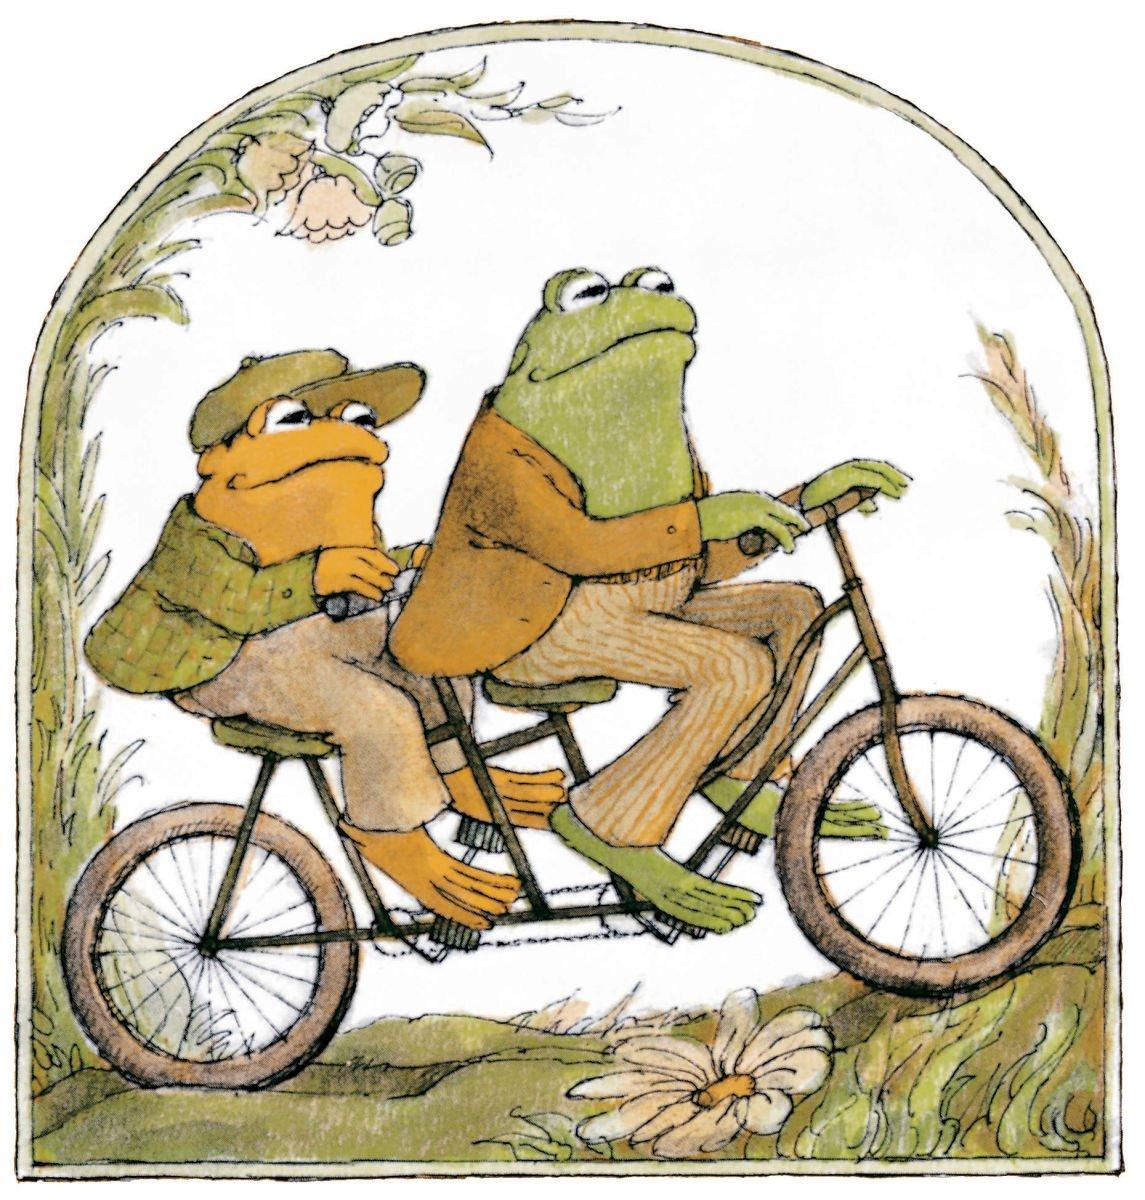 "Arnold Lobel's ""Frog and Toad"" endures as an amphibious celebration of same-sex love: https://t.co/VlpRZwdjzJ"